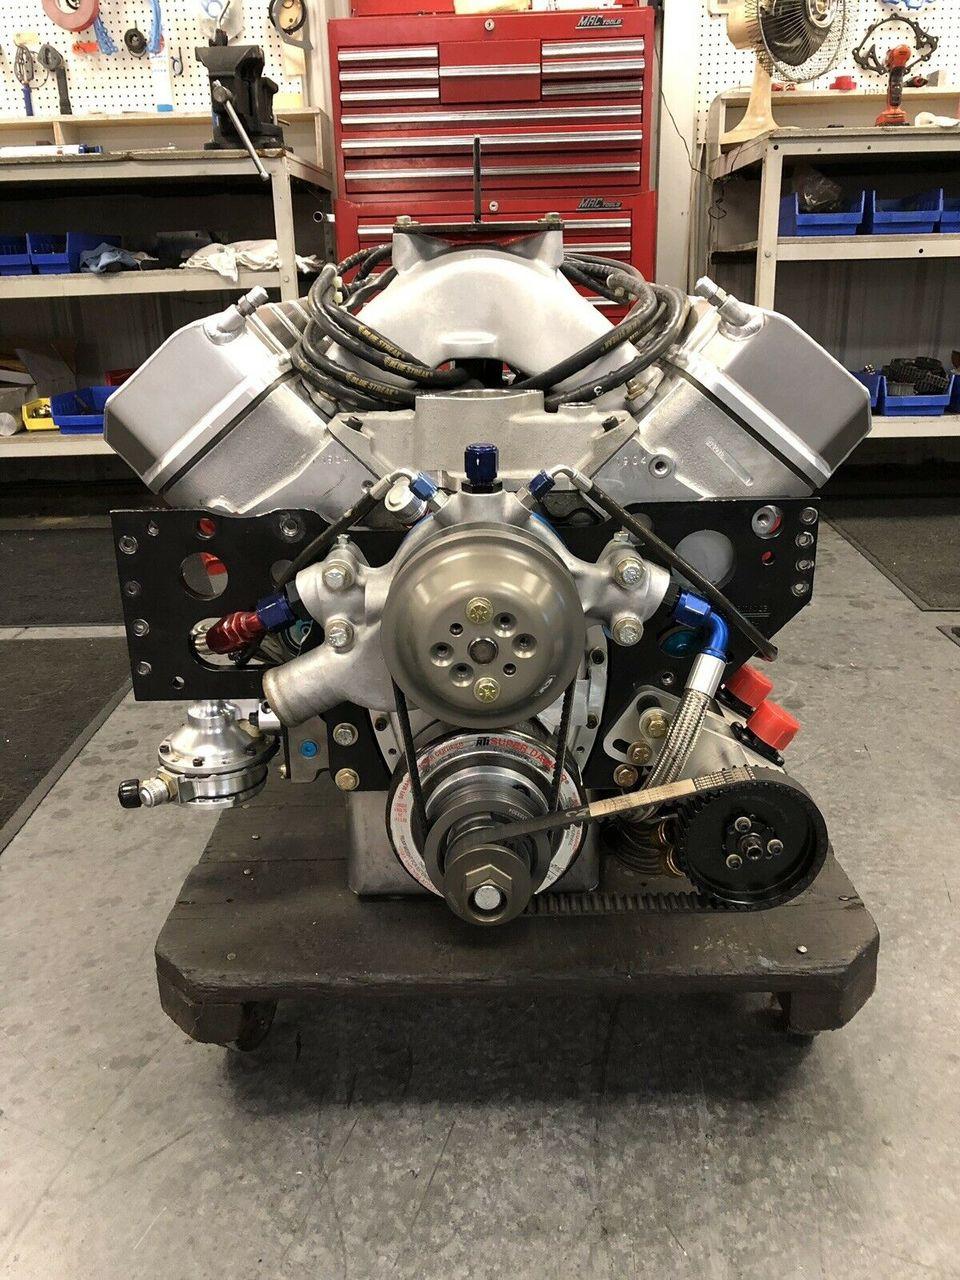 Nascar Engine Specs >> Fresh Built Nascar Chevy Sb2 2 Complete Race Engine 359cid 844 Hp 550 Ft Lb